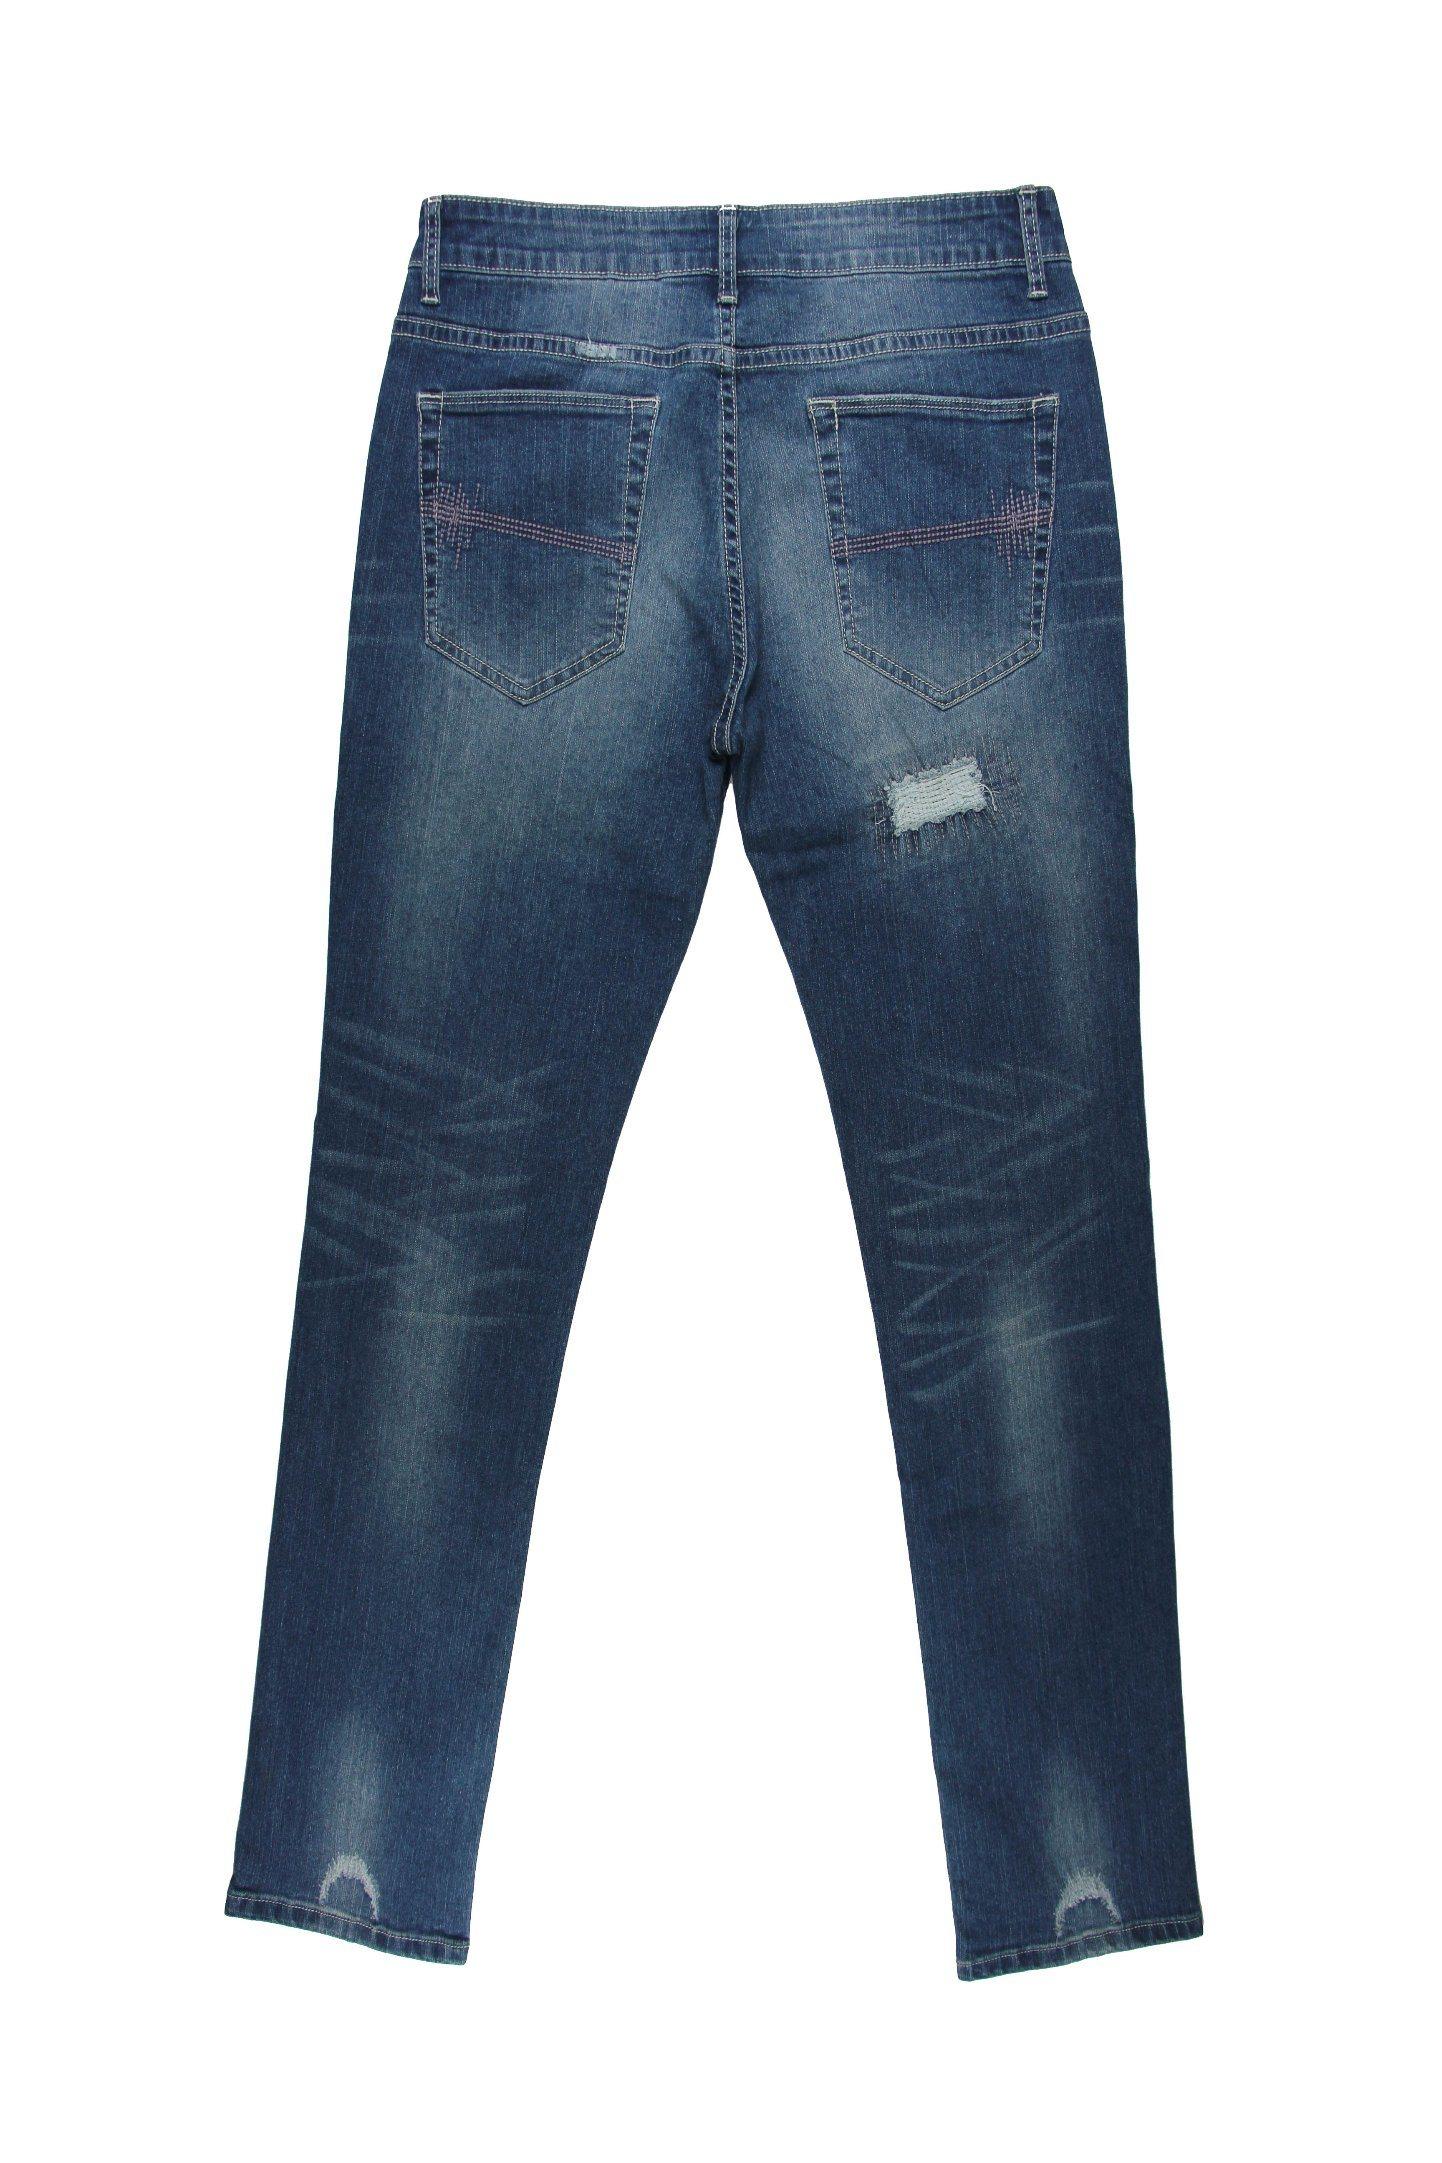 Good Quality Garment Factory of Men′s Denim (MYX14)